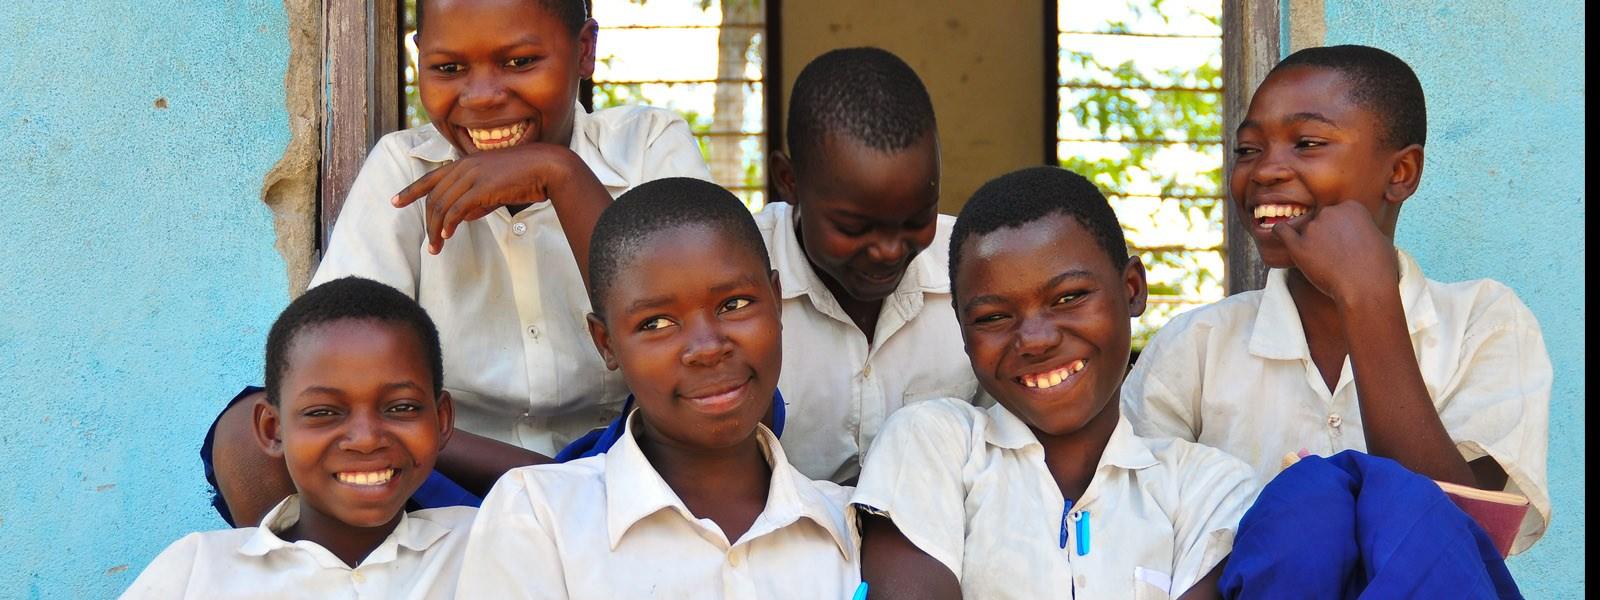 donate-amref-health-africa-kenya